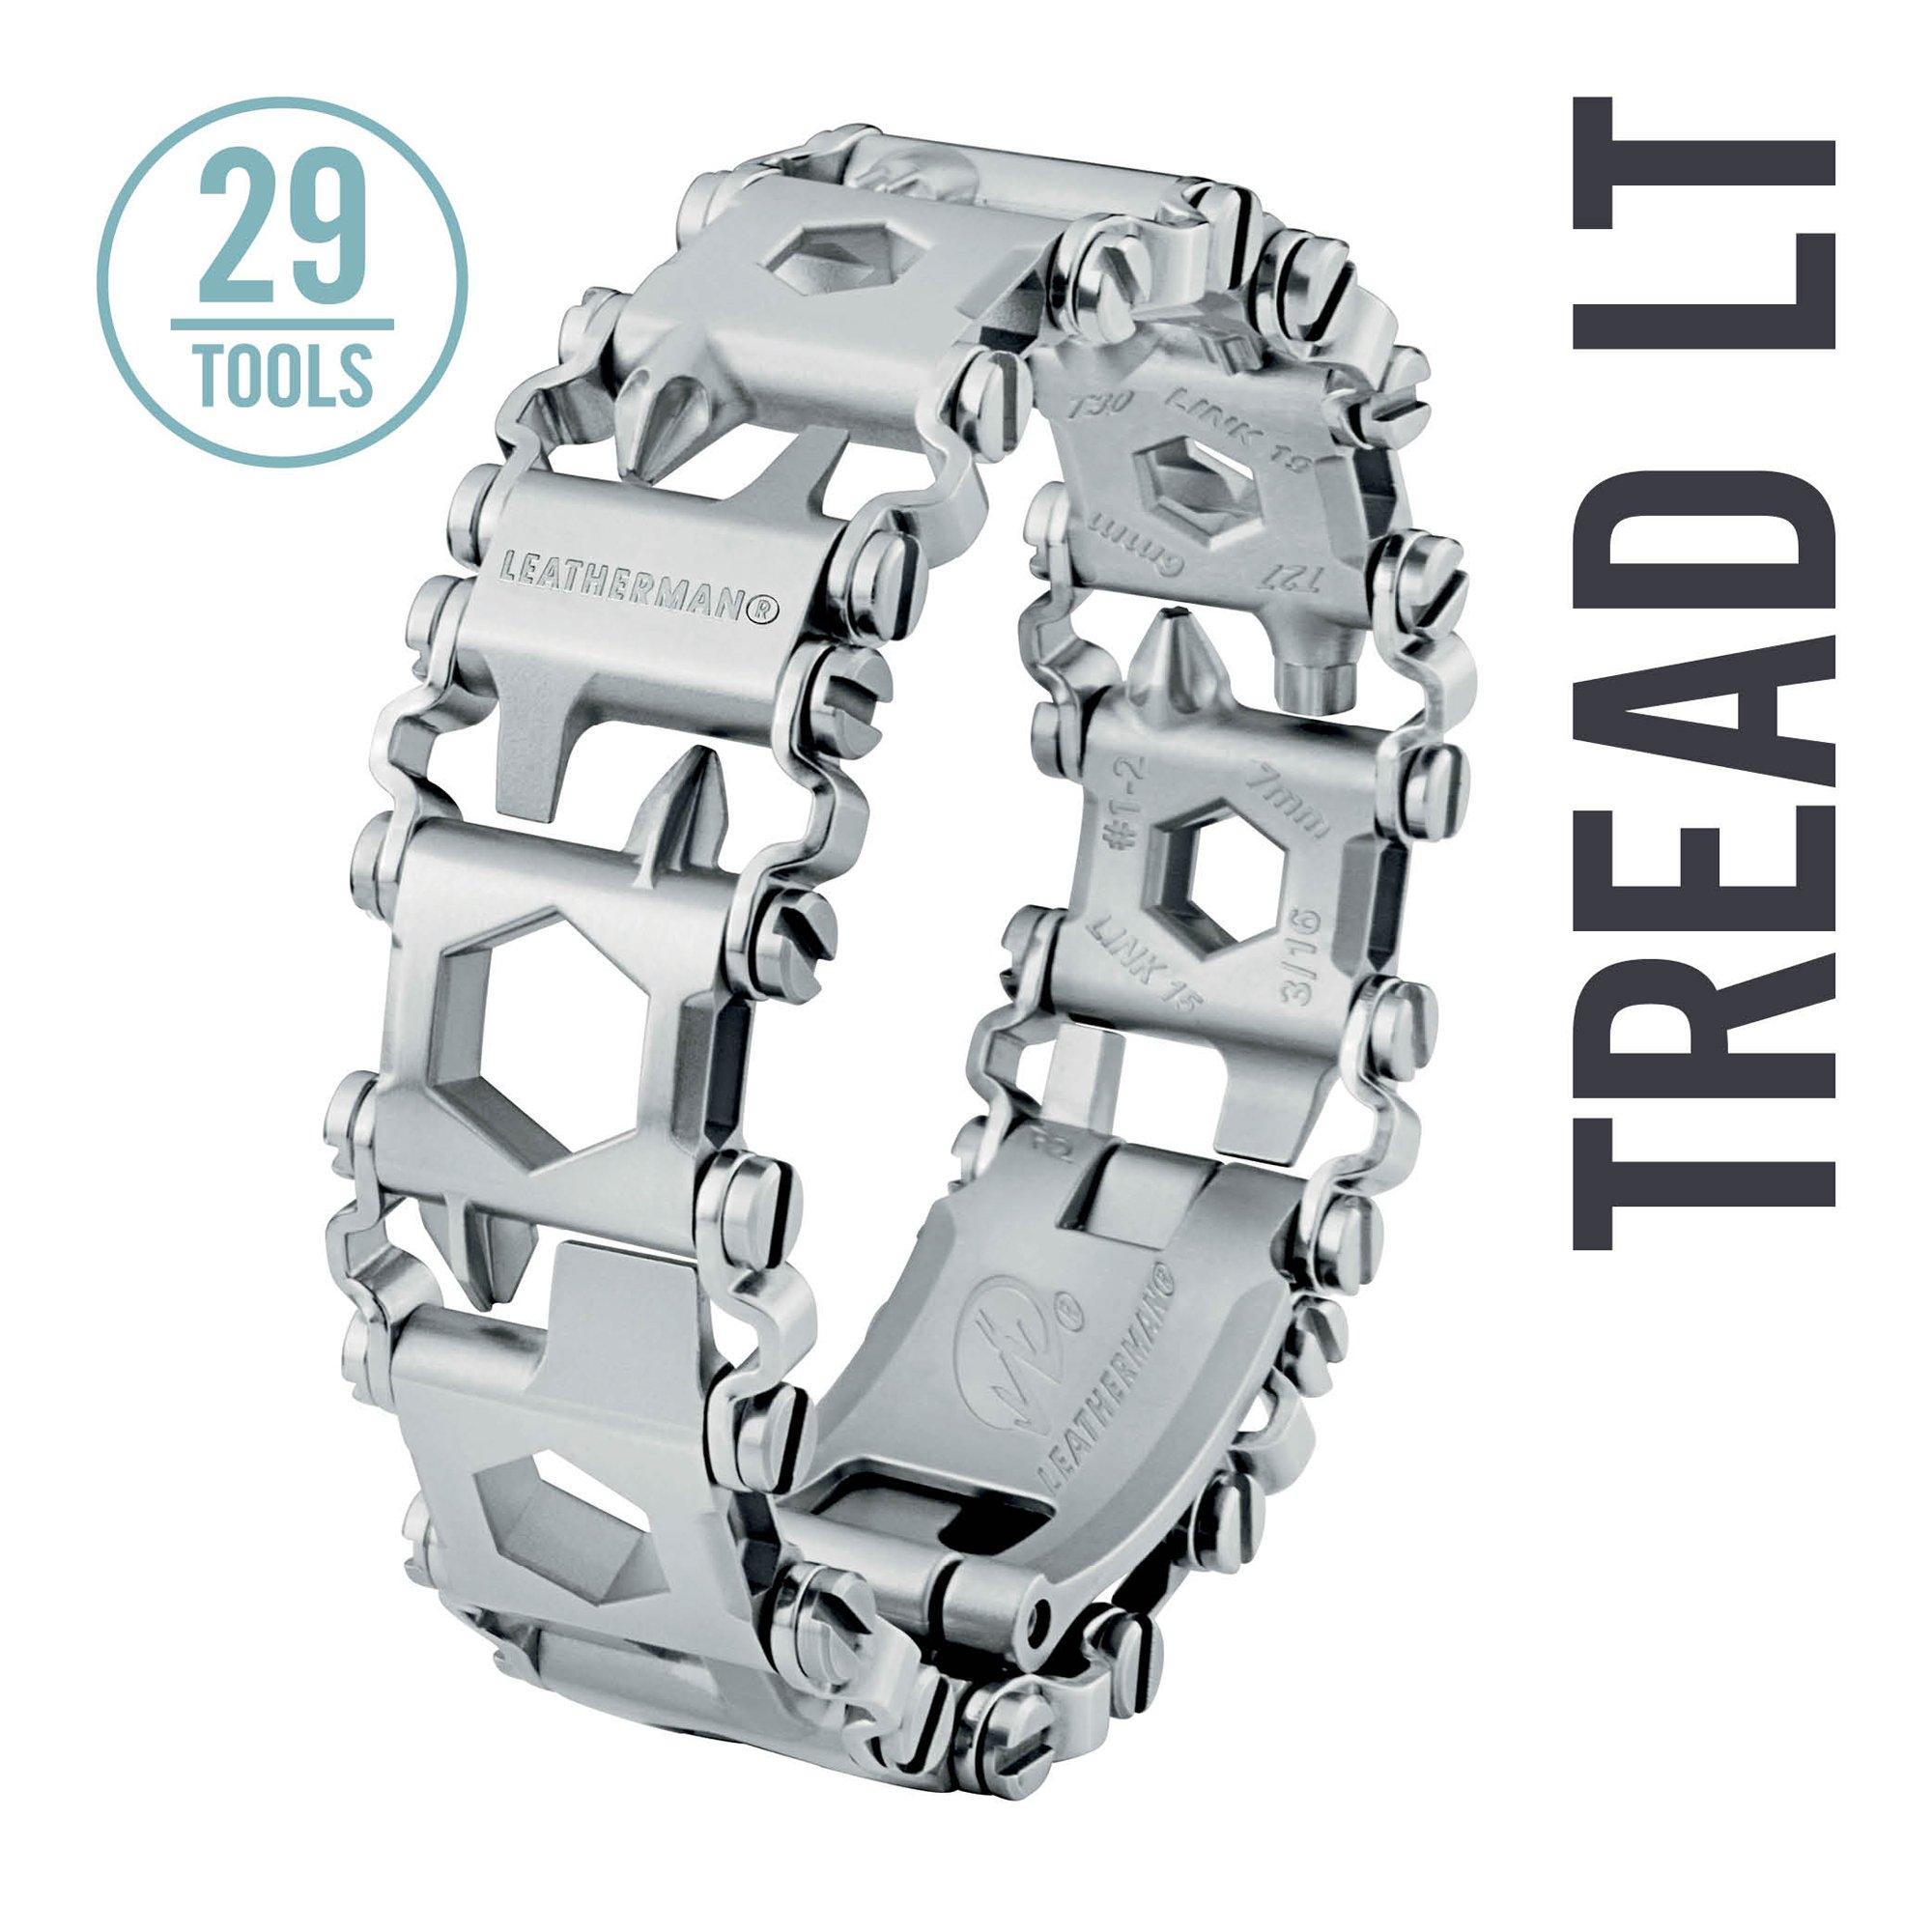 Leatherman - Tread LT Bracelet, The Smaller Travel Friendly Wearable Multitool, Stainless Steel